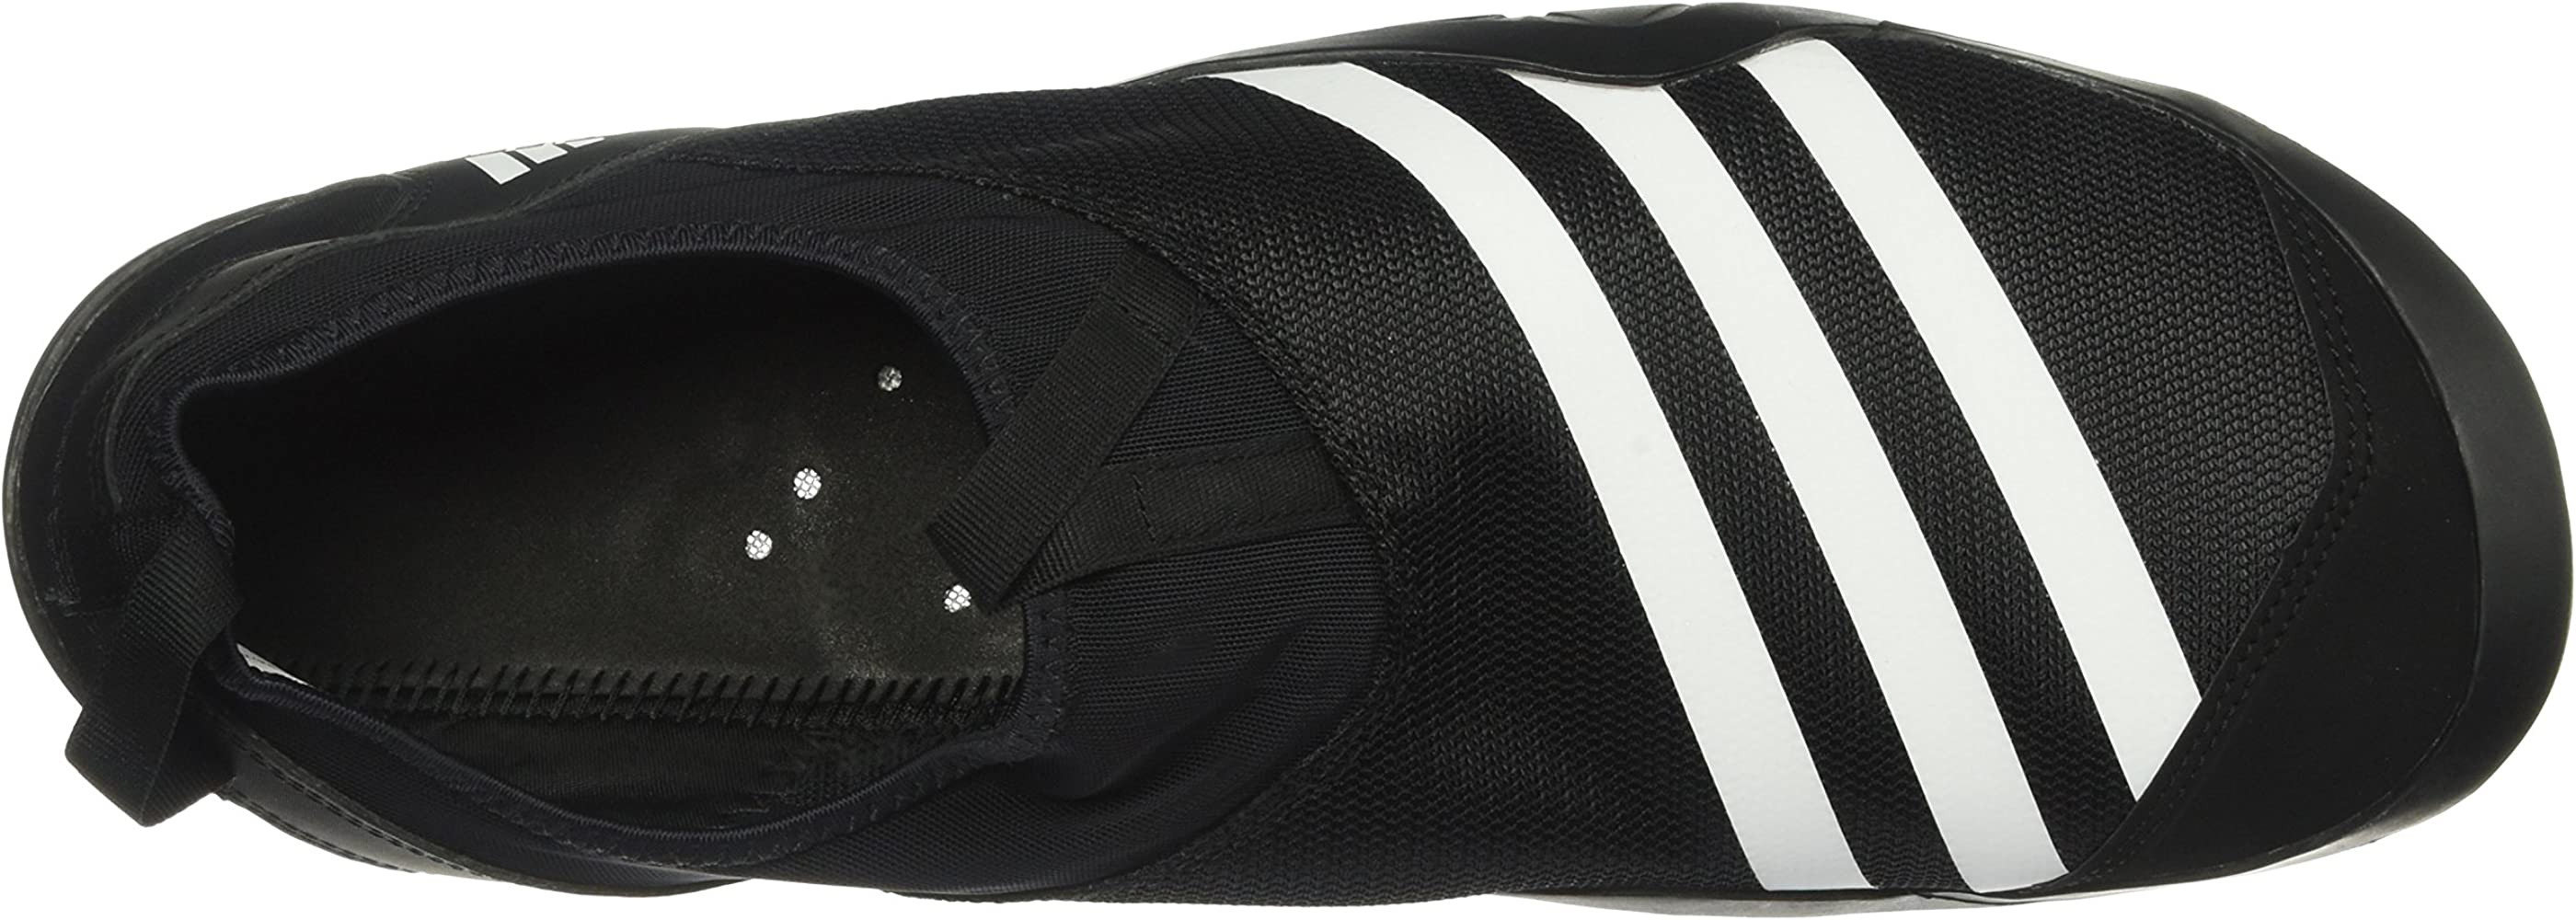 adidas jawpaw black